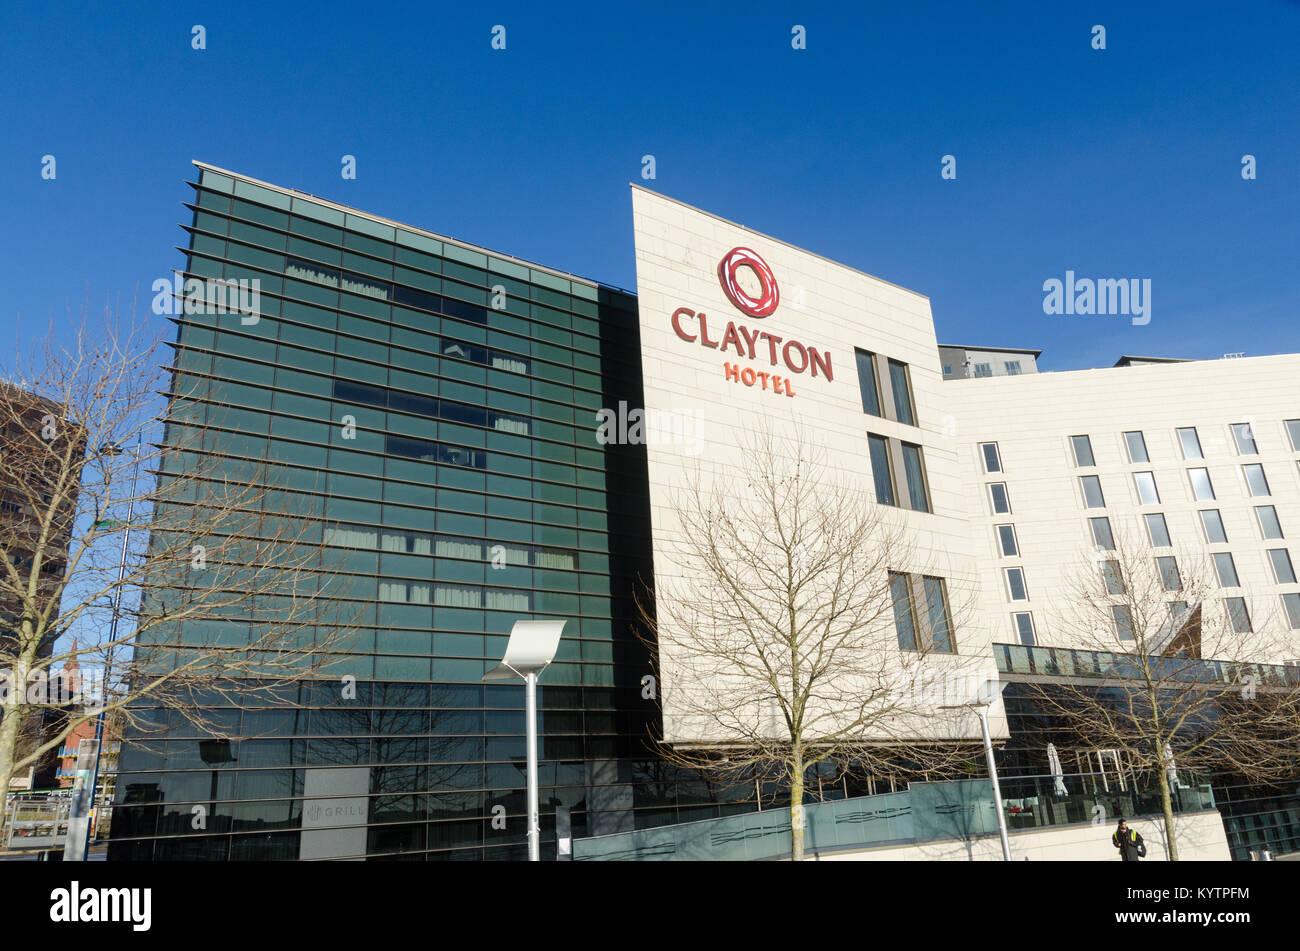 Clayton Hotel in Albert Street, Birmingham City Centre - Stock Image